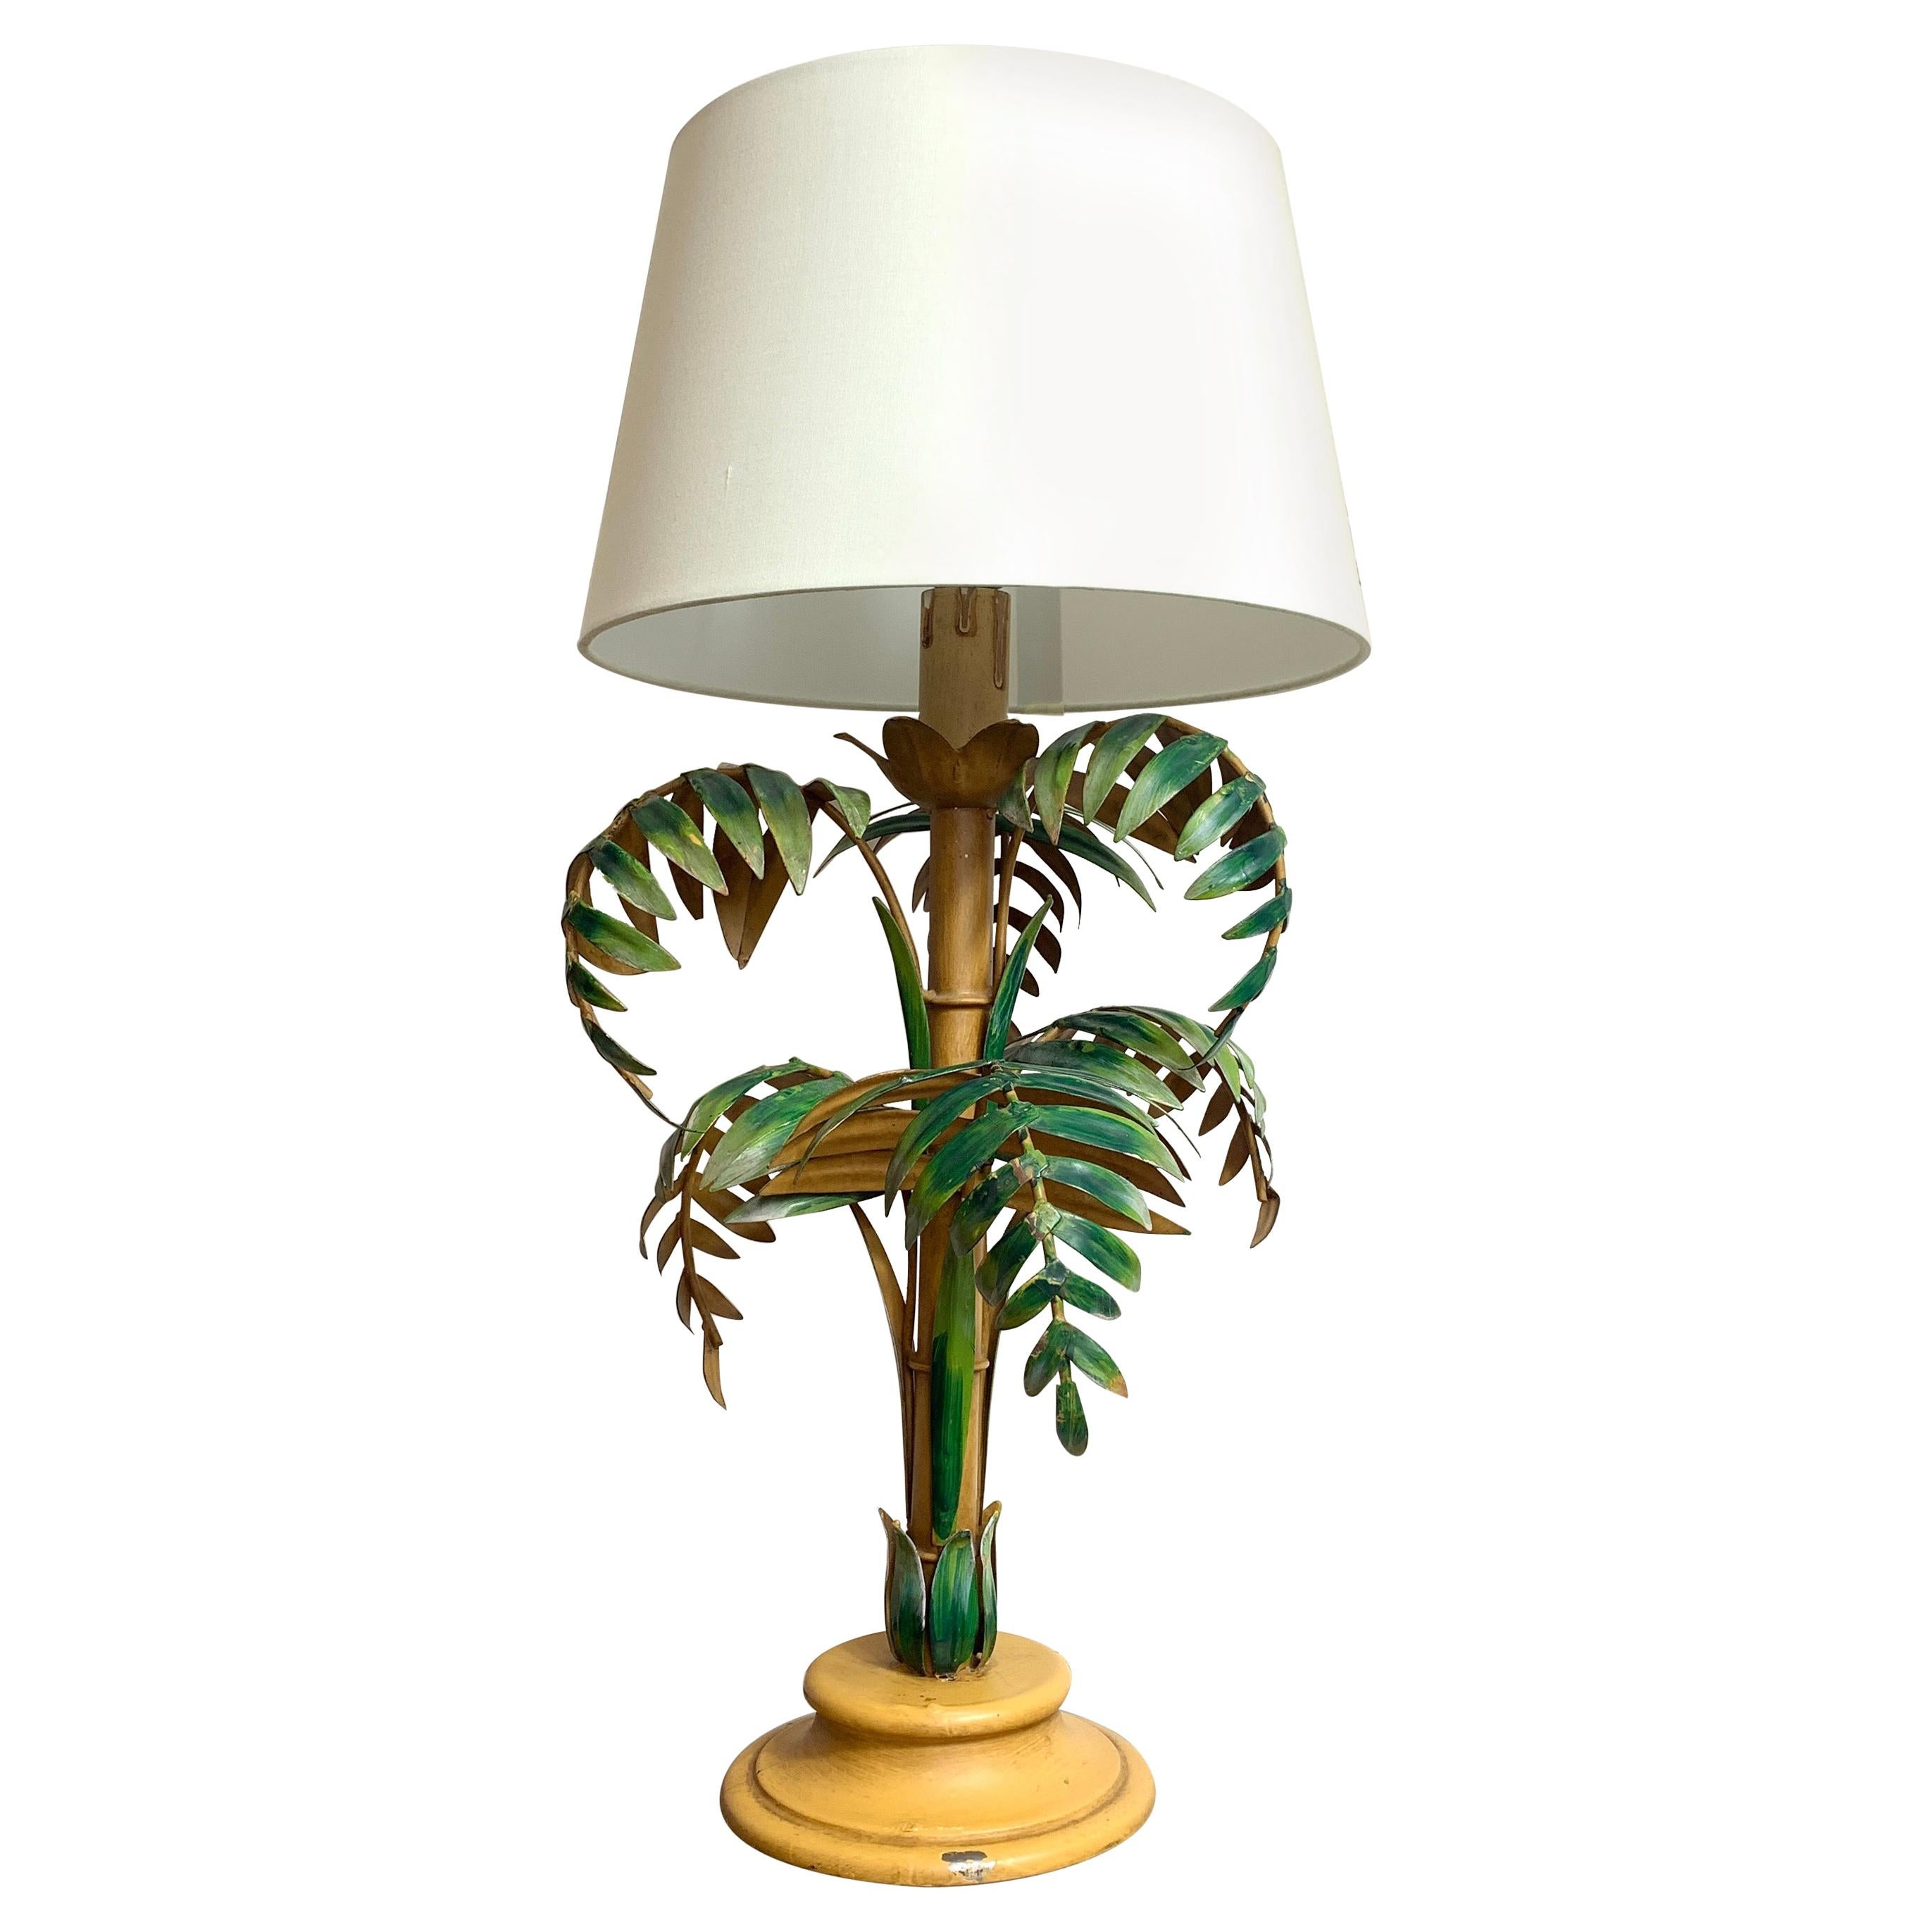 Midcentury, Tole Palm Tree Table Lamp